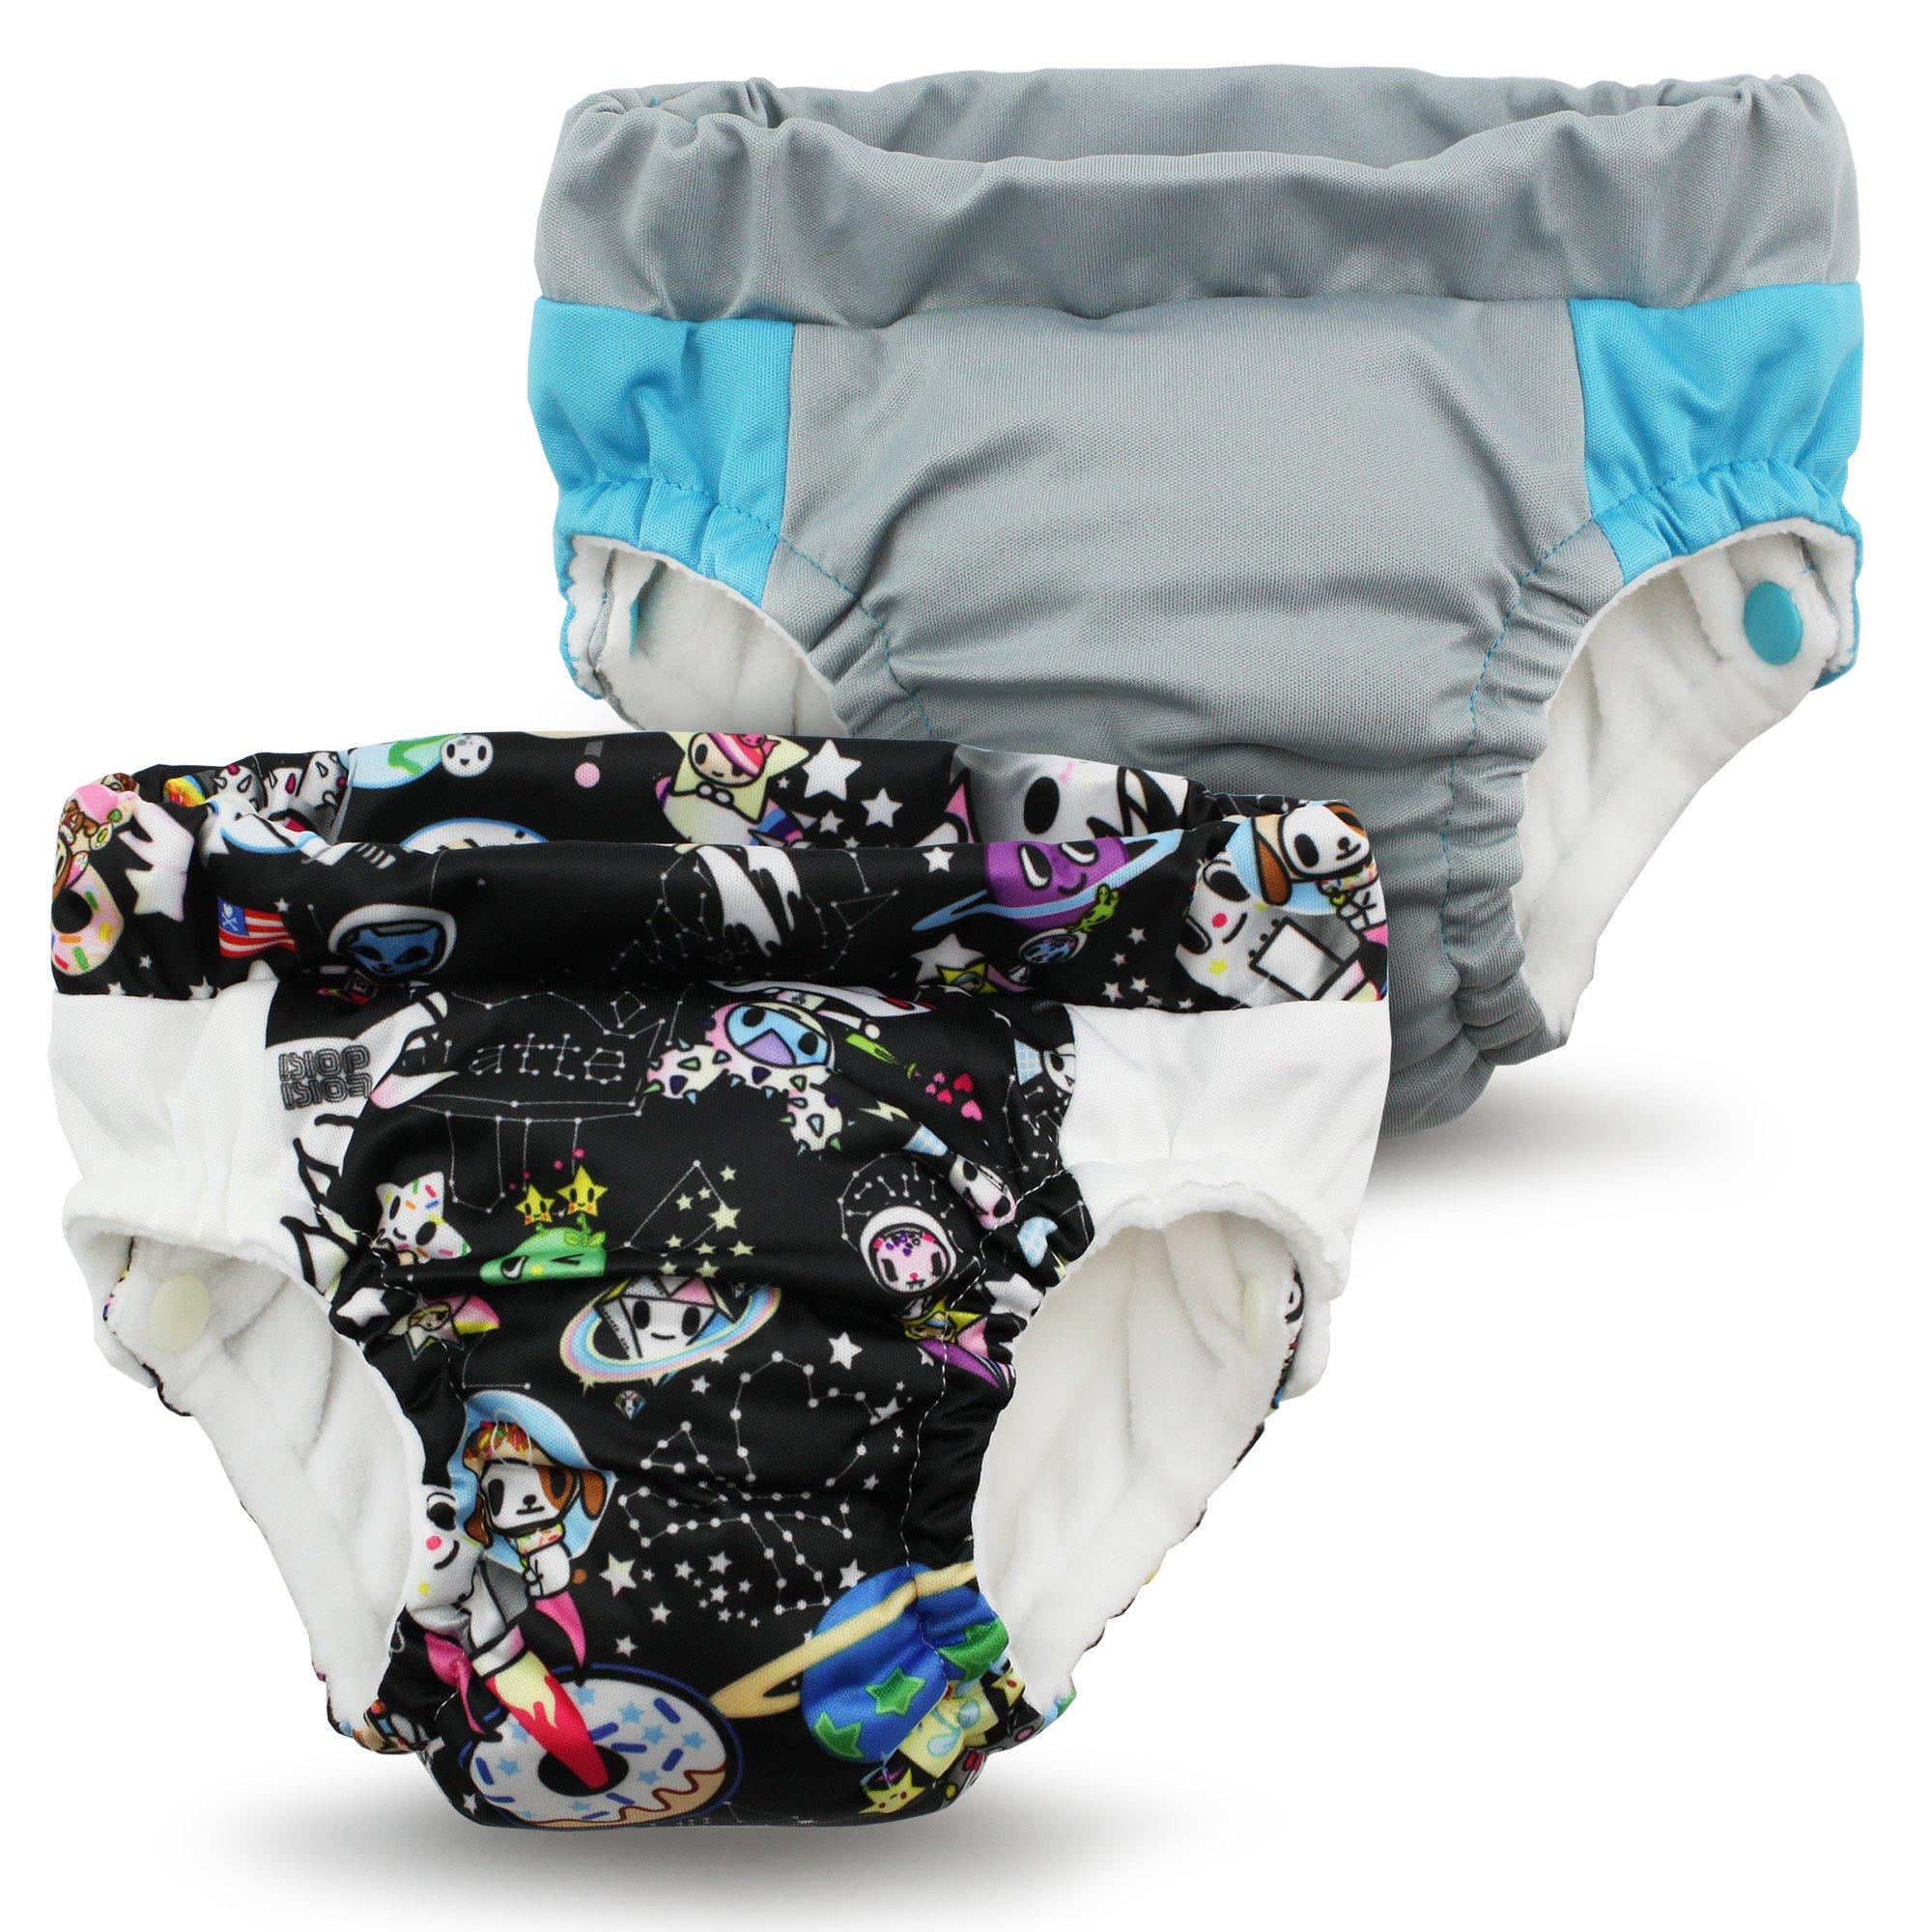 Kanga Care Lil Learnerz Toilet Training Pants, Tokispace & Platinum, X-Small